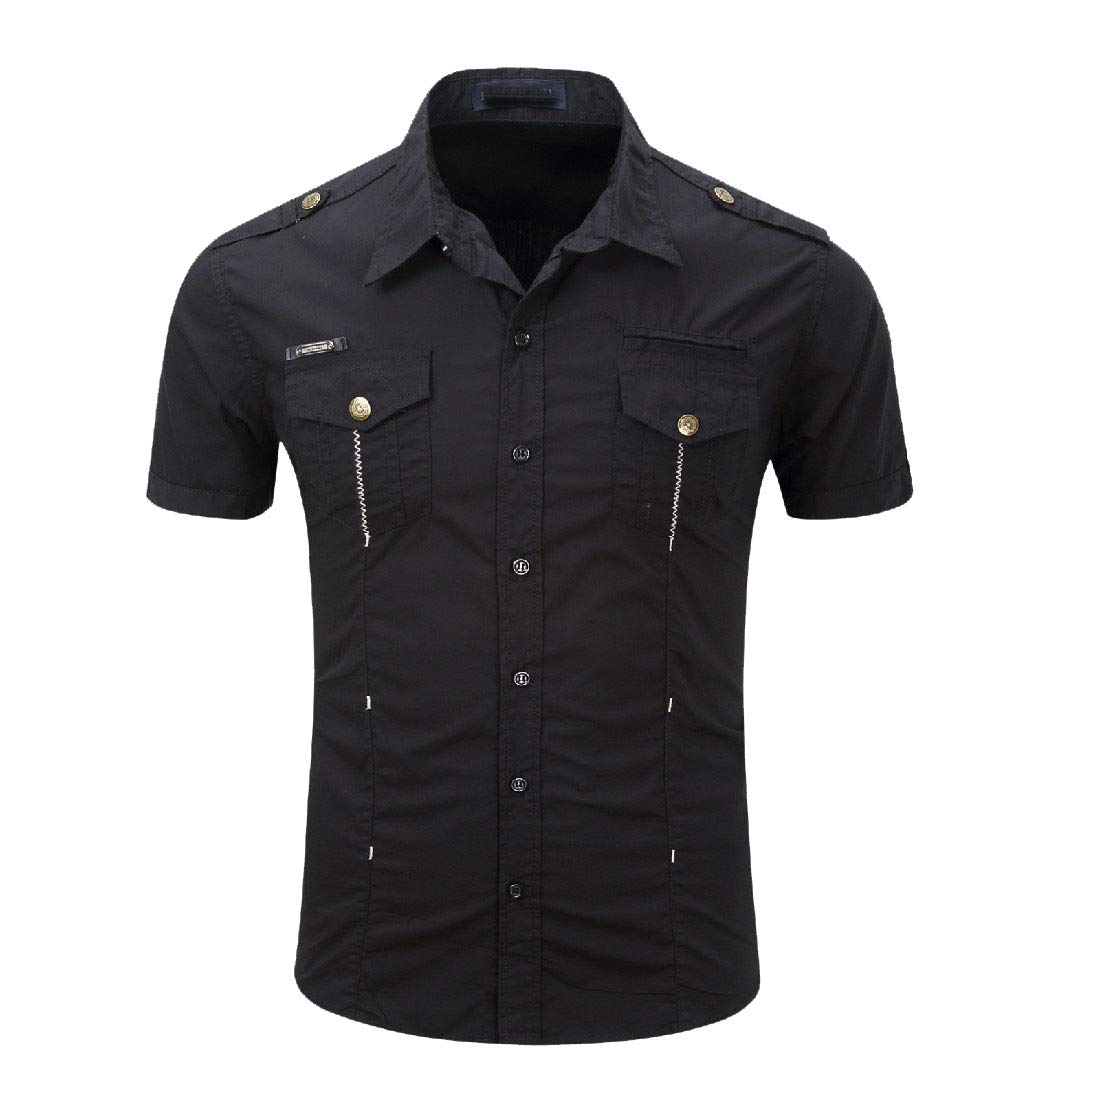 YUNY Mens Cargo Pocket Outdoor Flat Collar Short Sleeve Leisure Work Shirt Black M